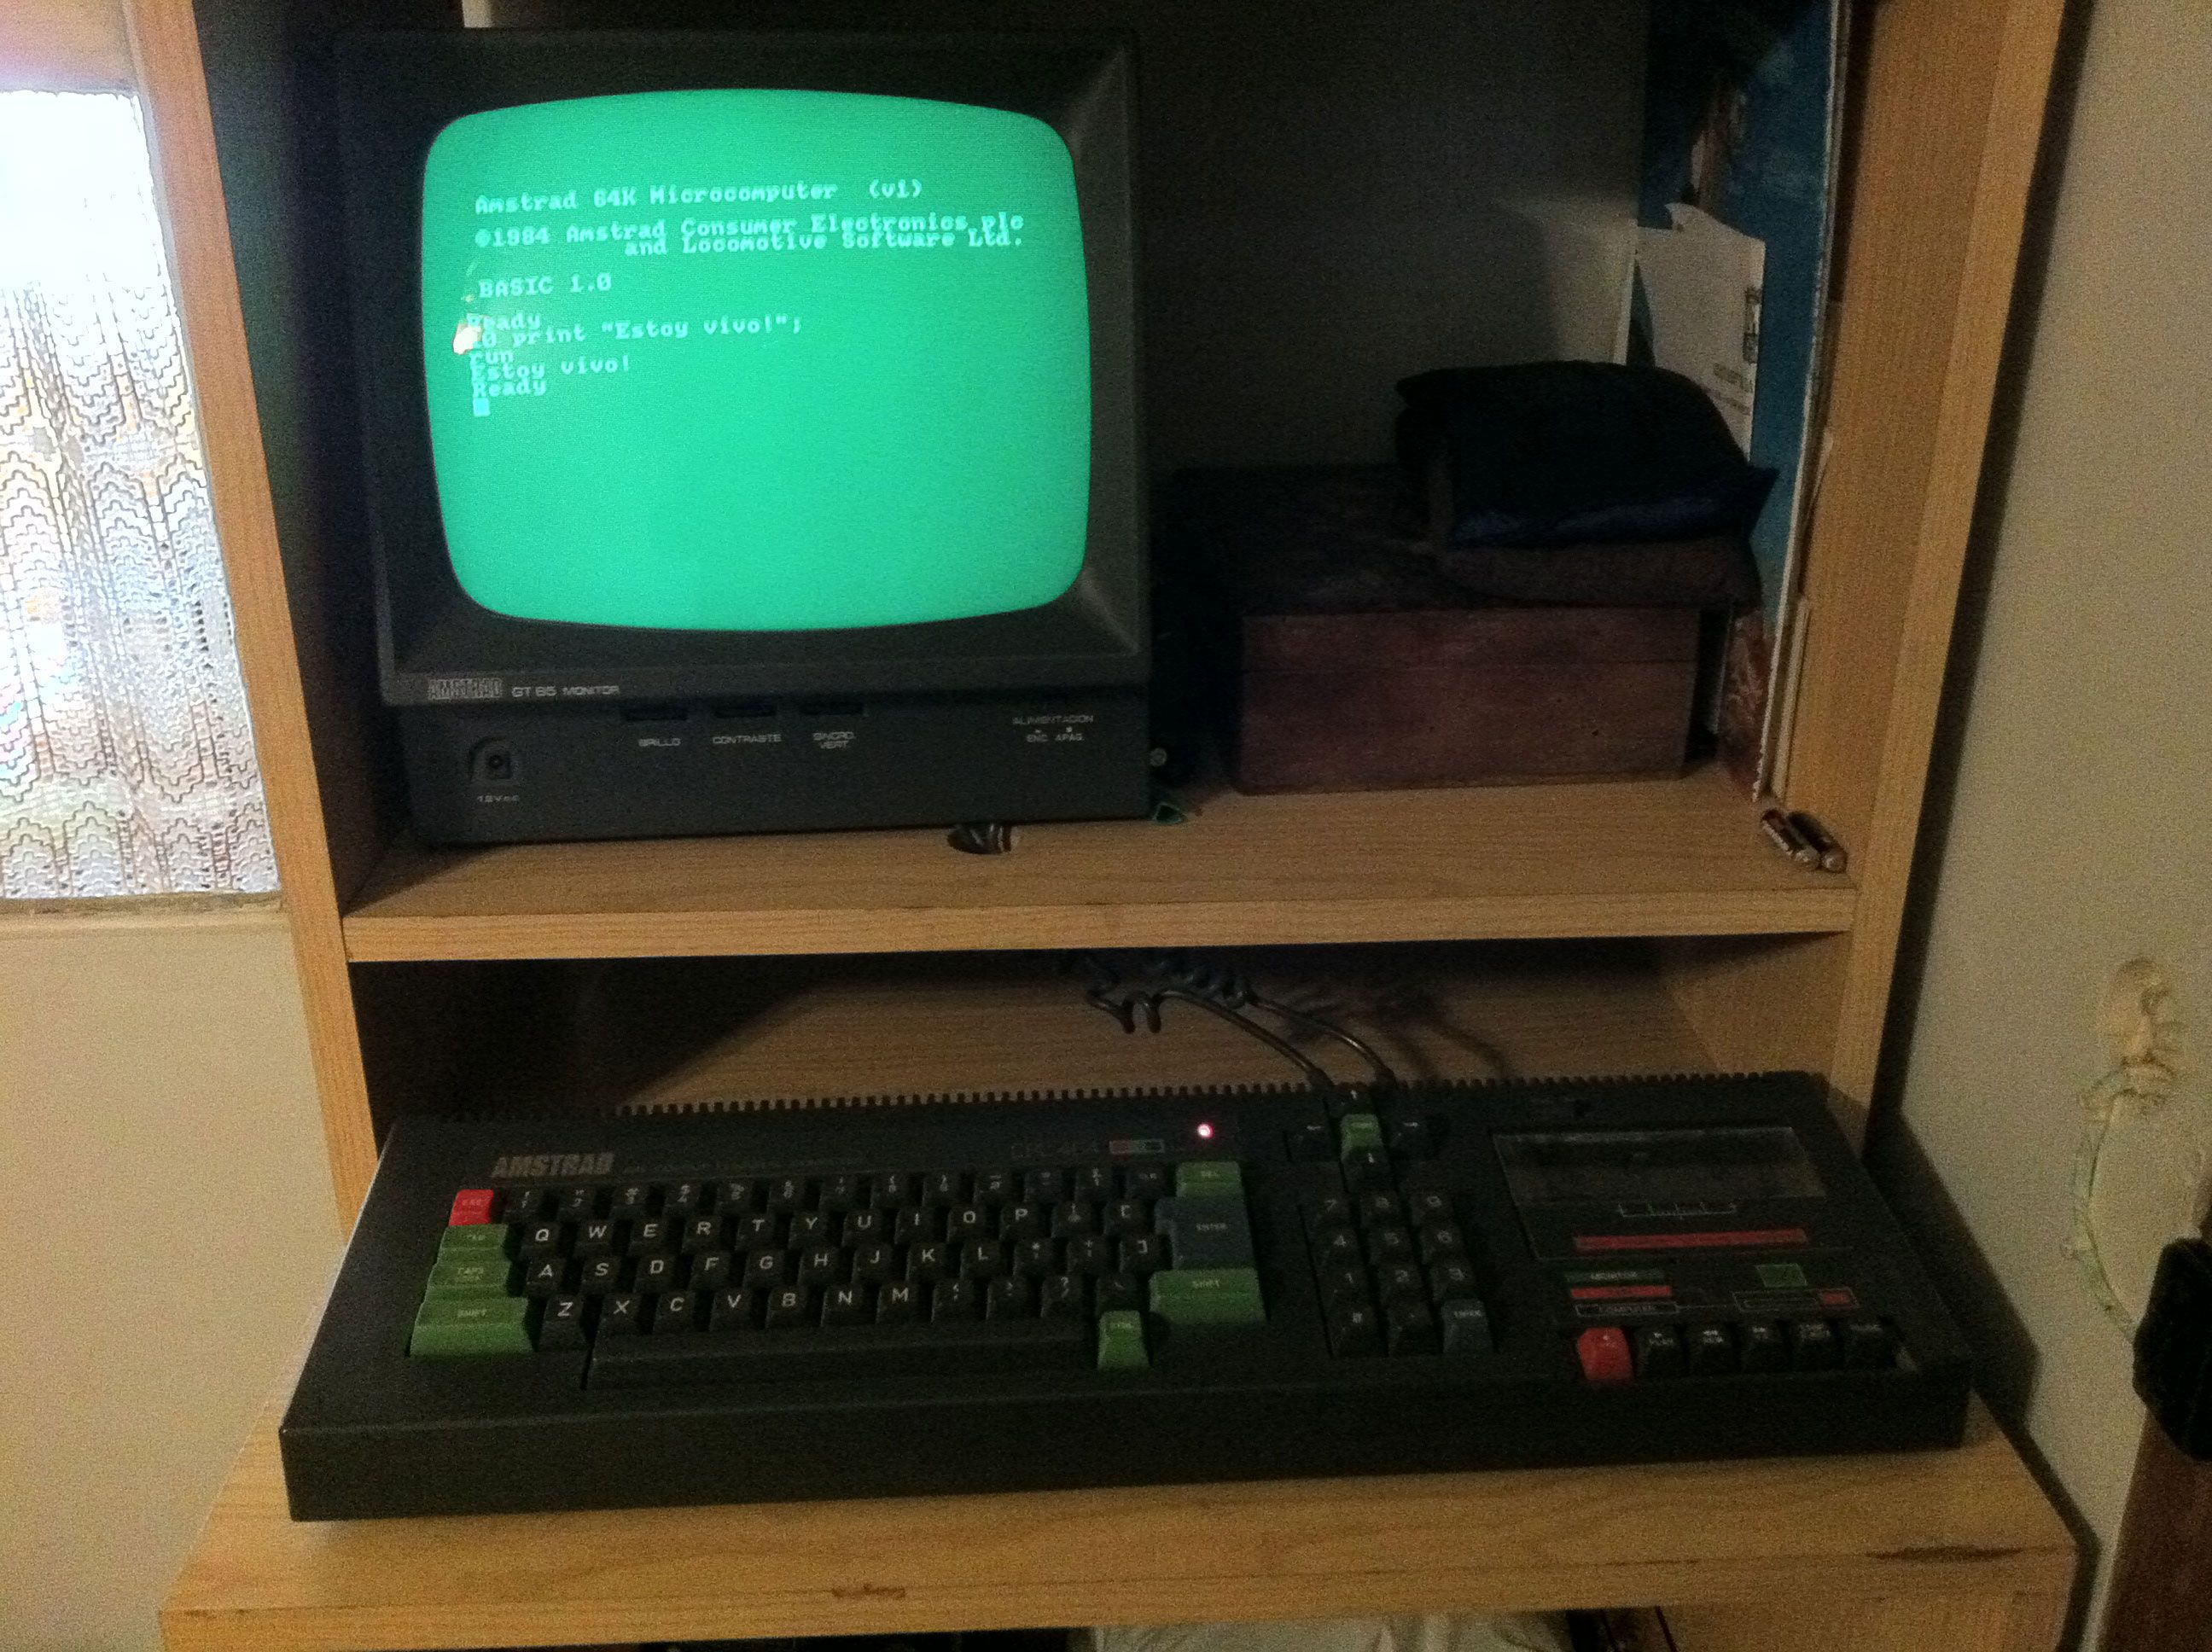 Mi Amstrad CPC 464, working like a charm.